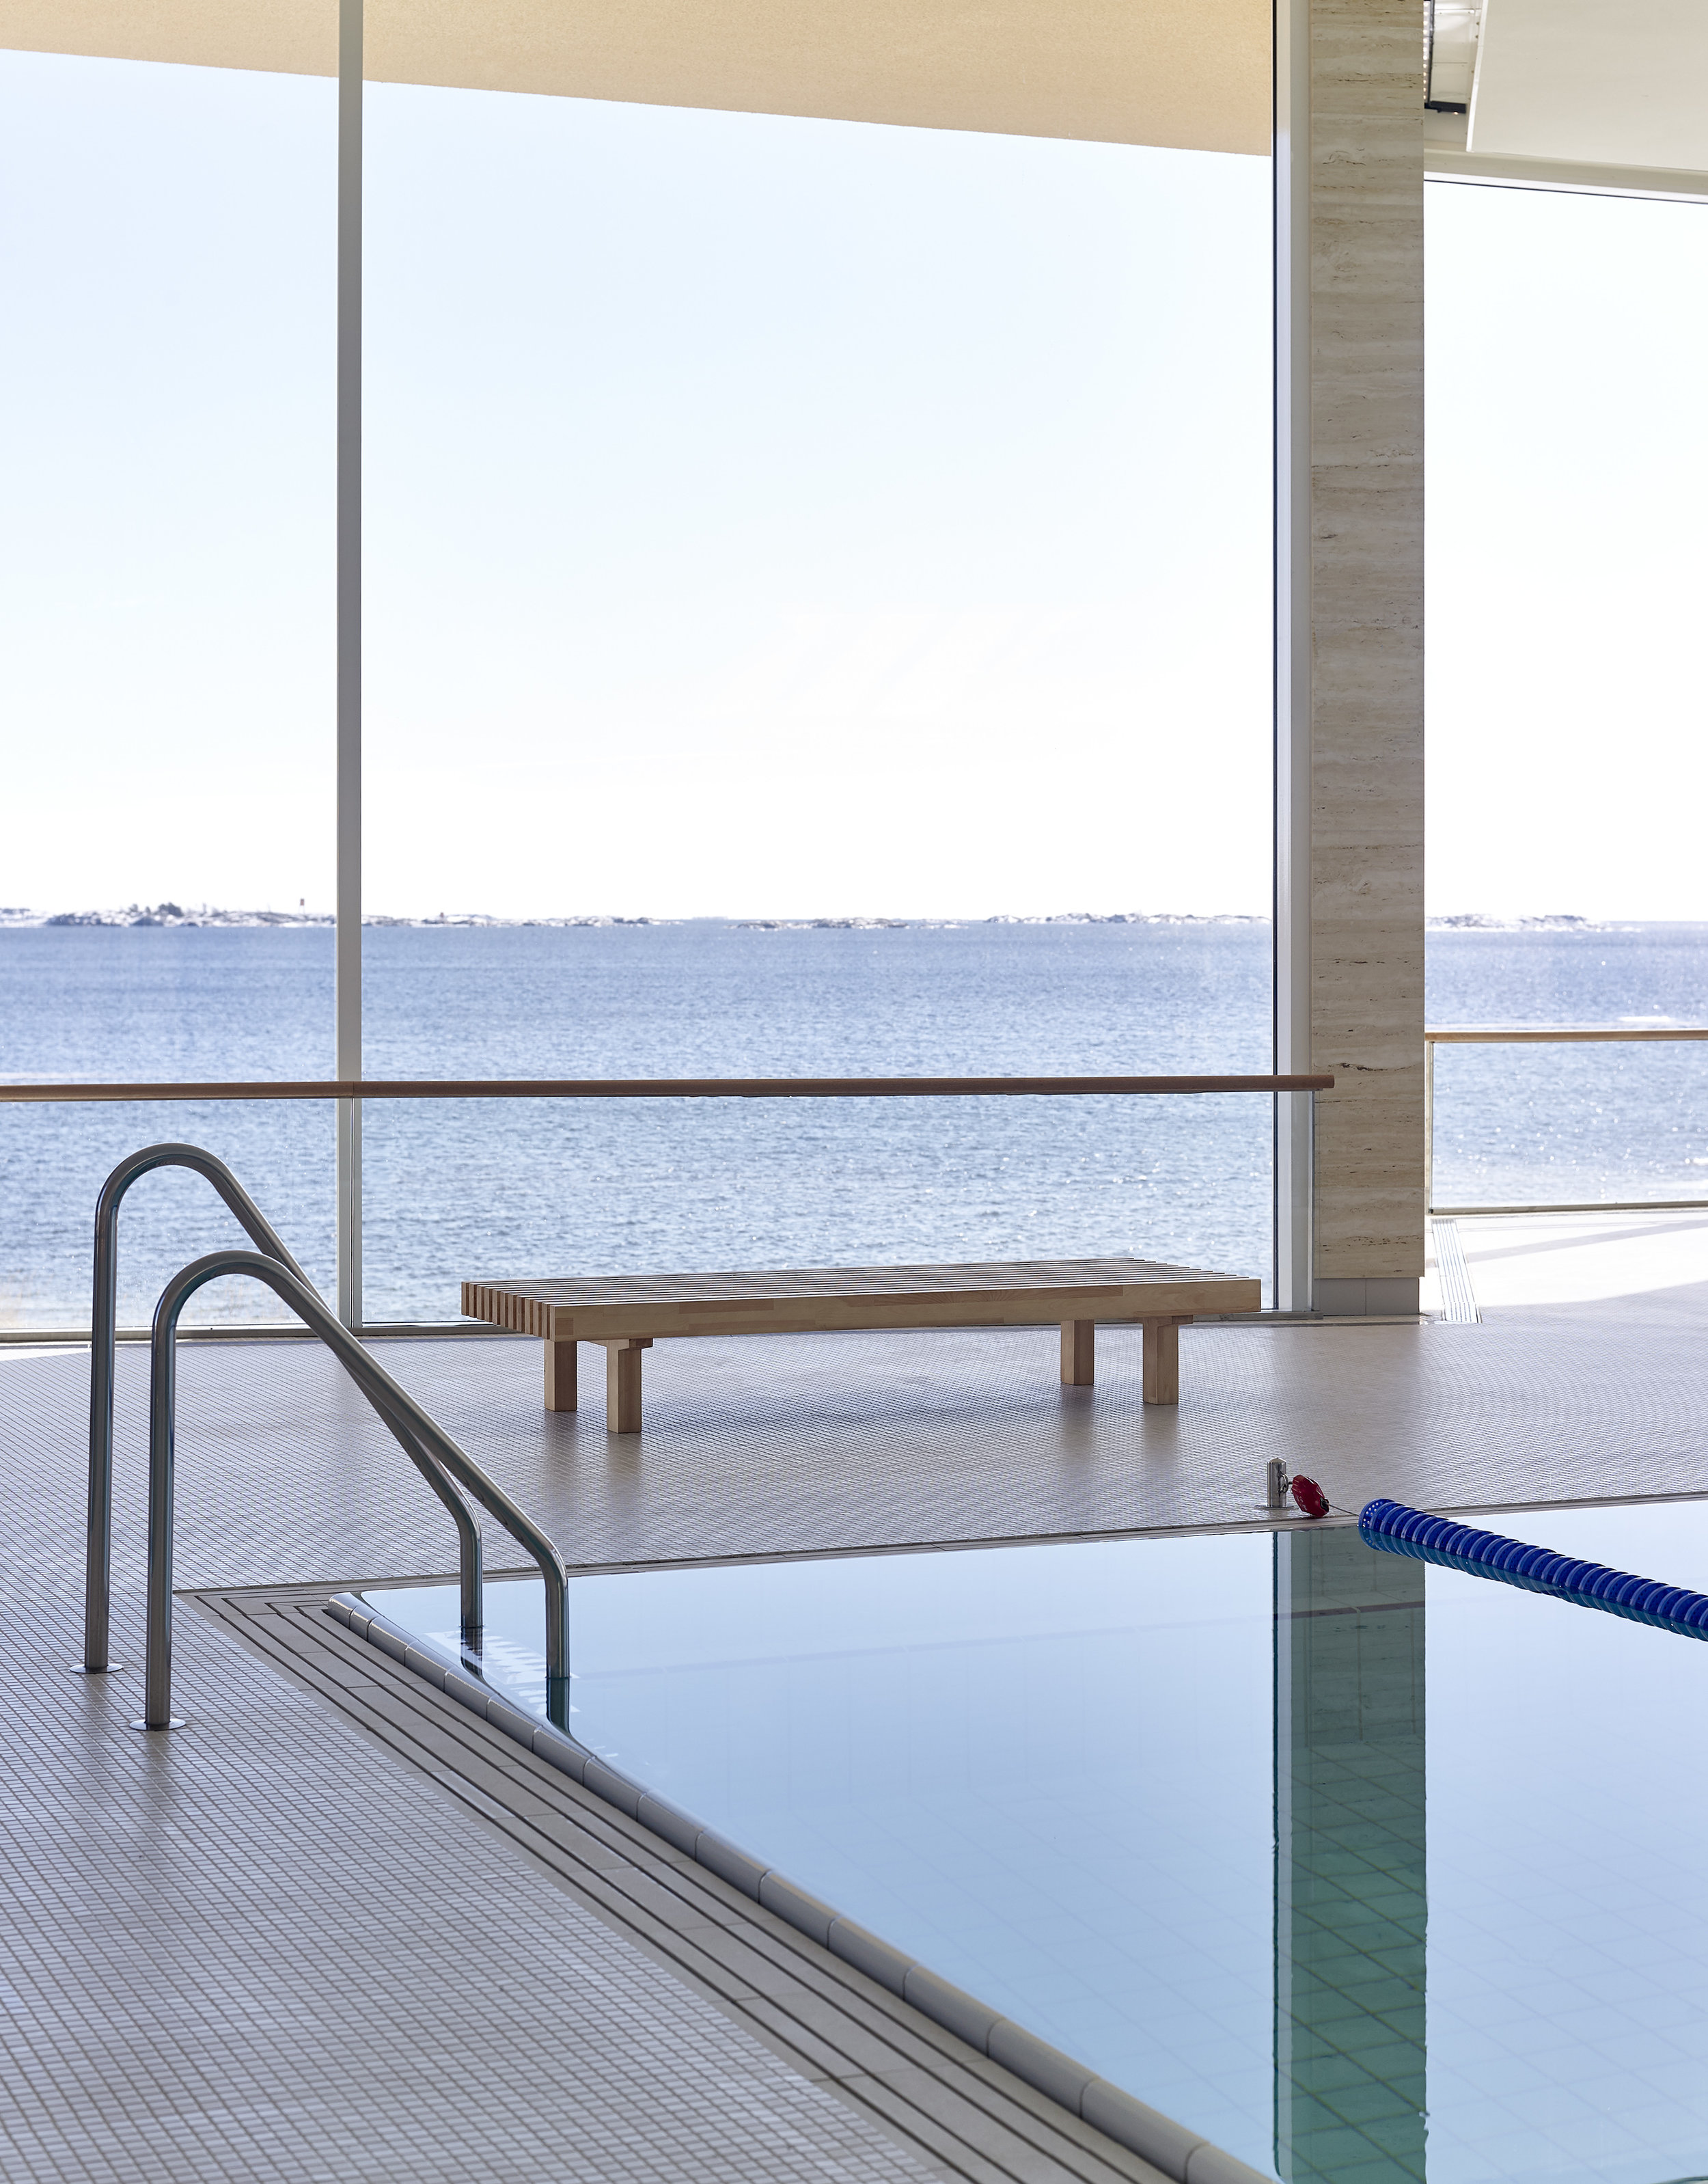 Laveri bench, 80x200x37 cm, larch